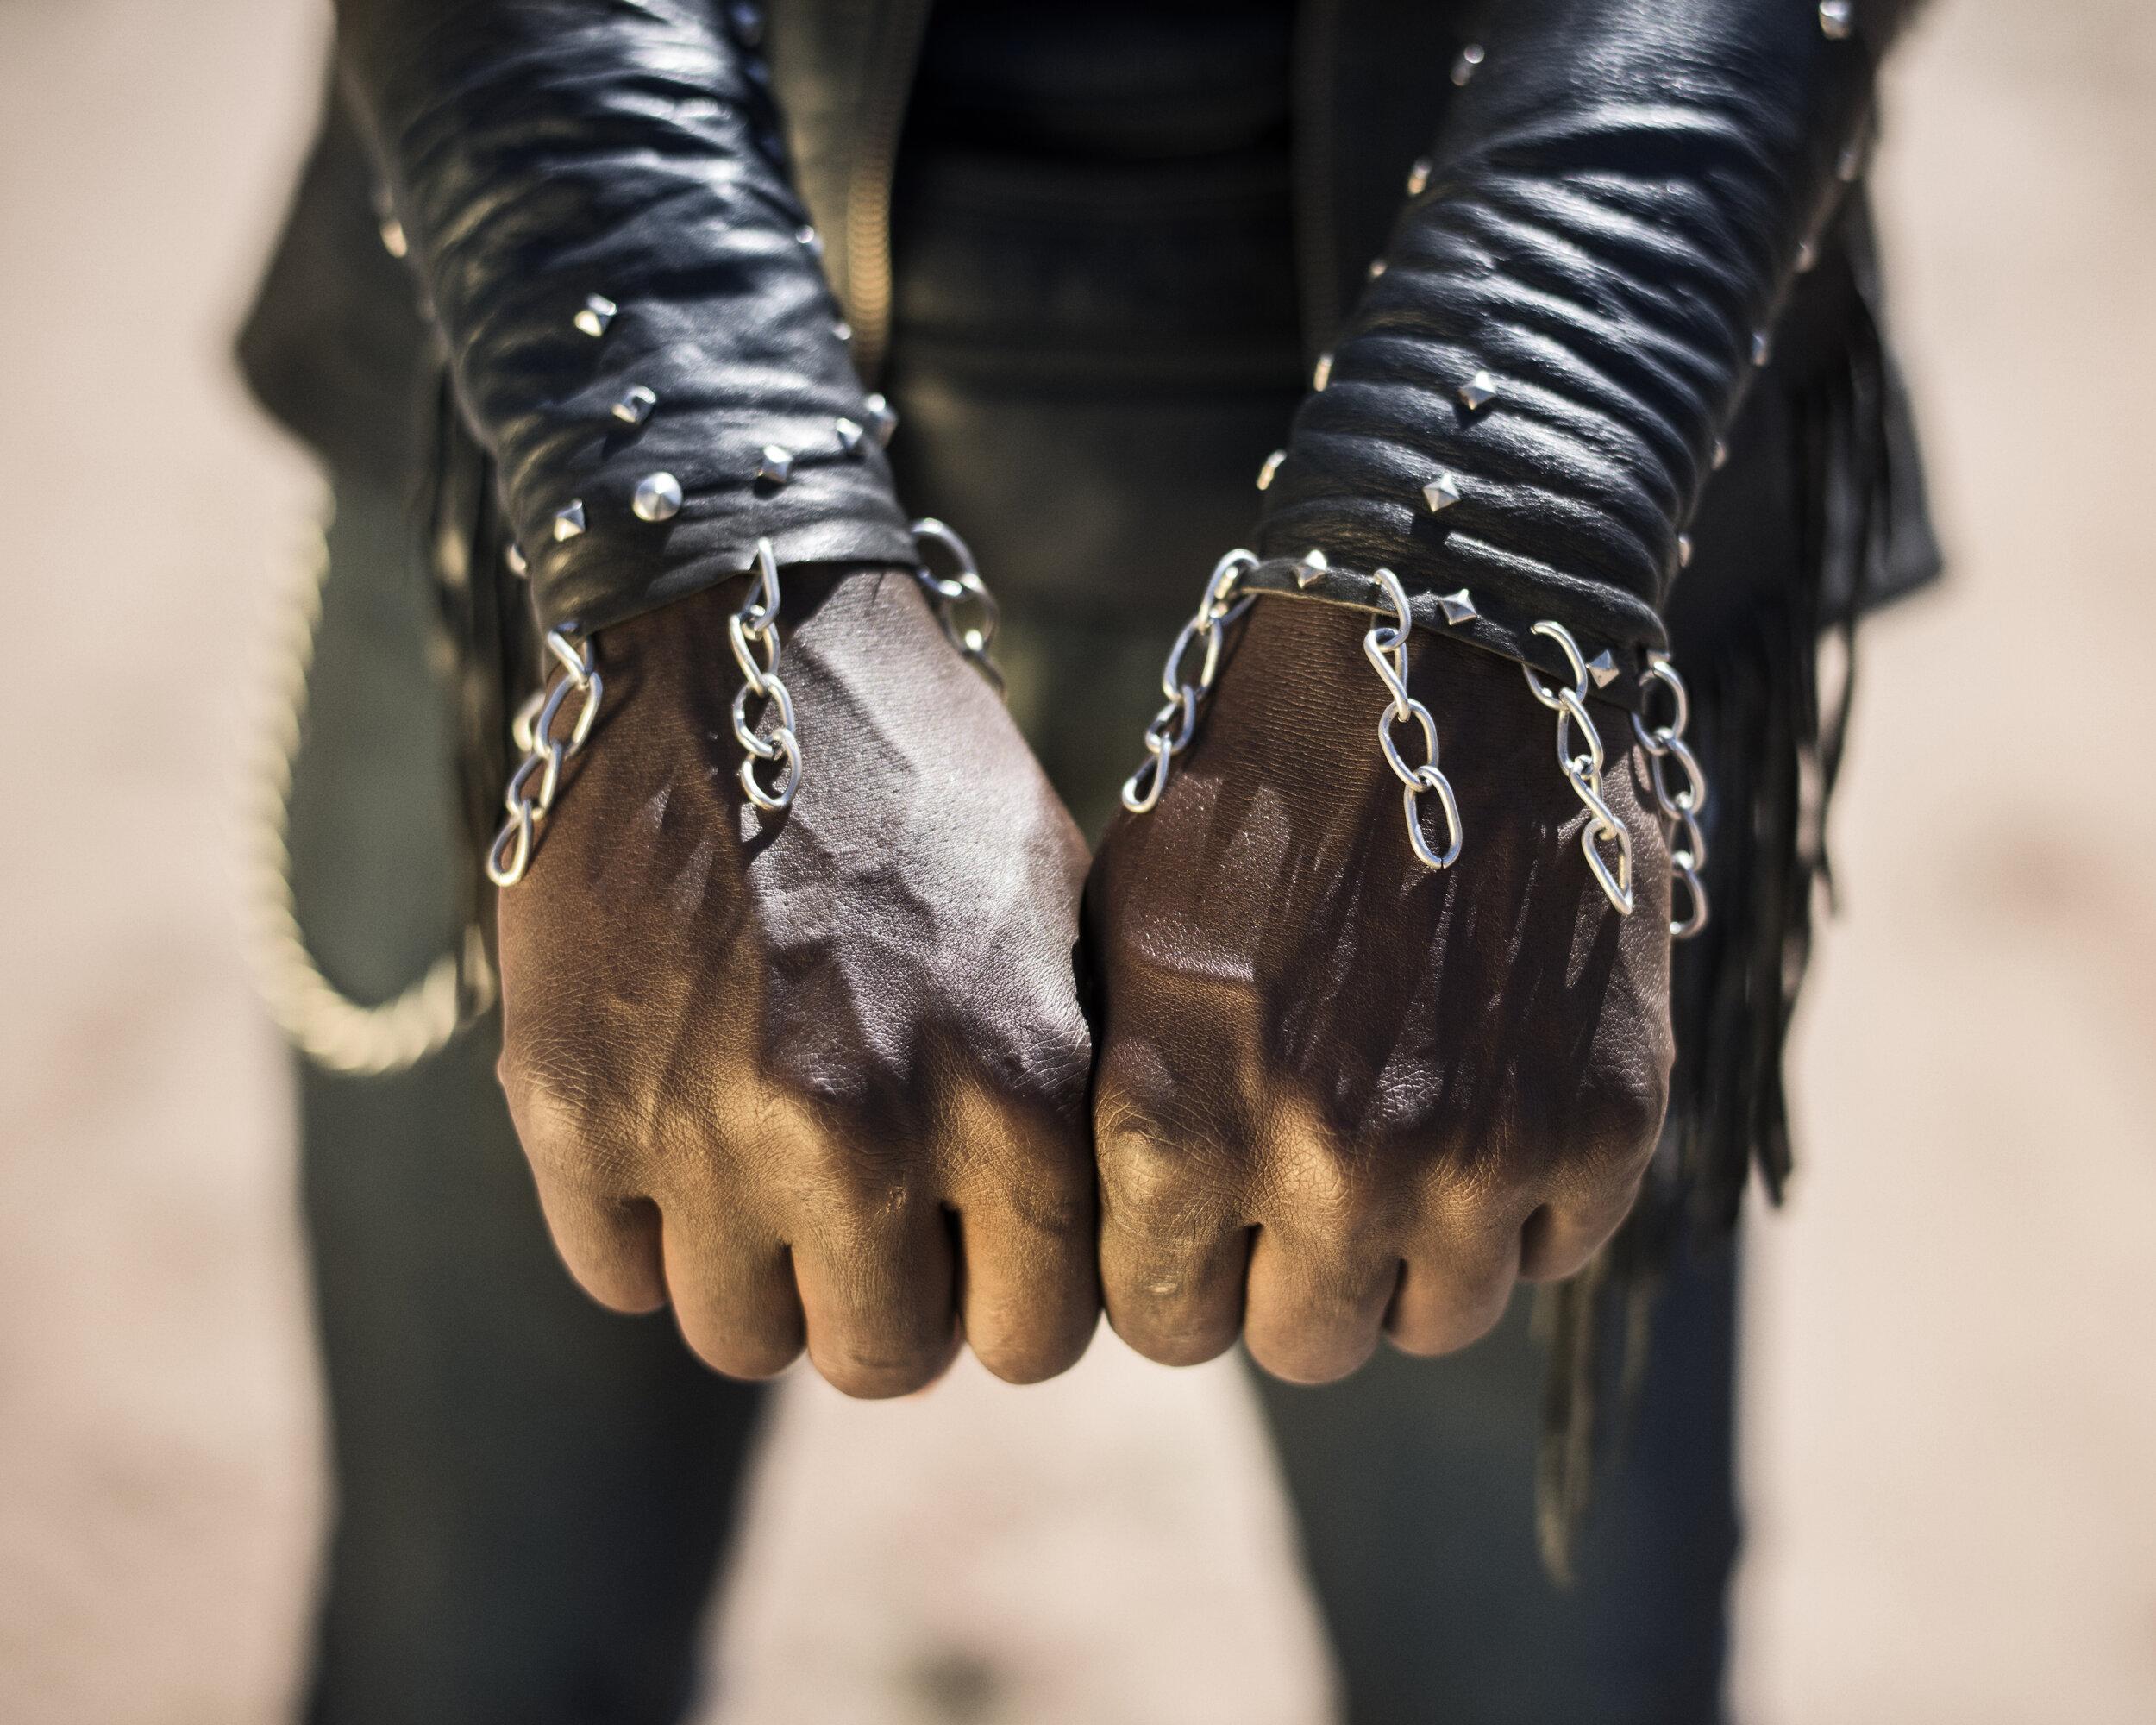 "Botswana, Ghanzi, May 20178th Anniversary Overthrust ""Winter Metal Mania Fest 2017"". Maxao Debele aka DIDI ROKK from Ghanzi. He doesn't play in band but likes the music and the metal community, his ""true brothers"".Pep Bonet / NOOR"